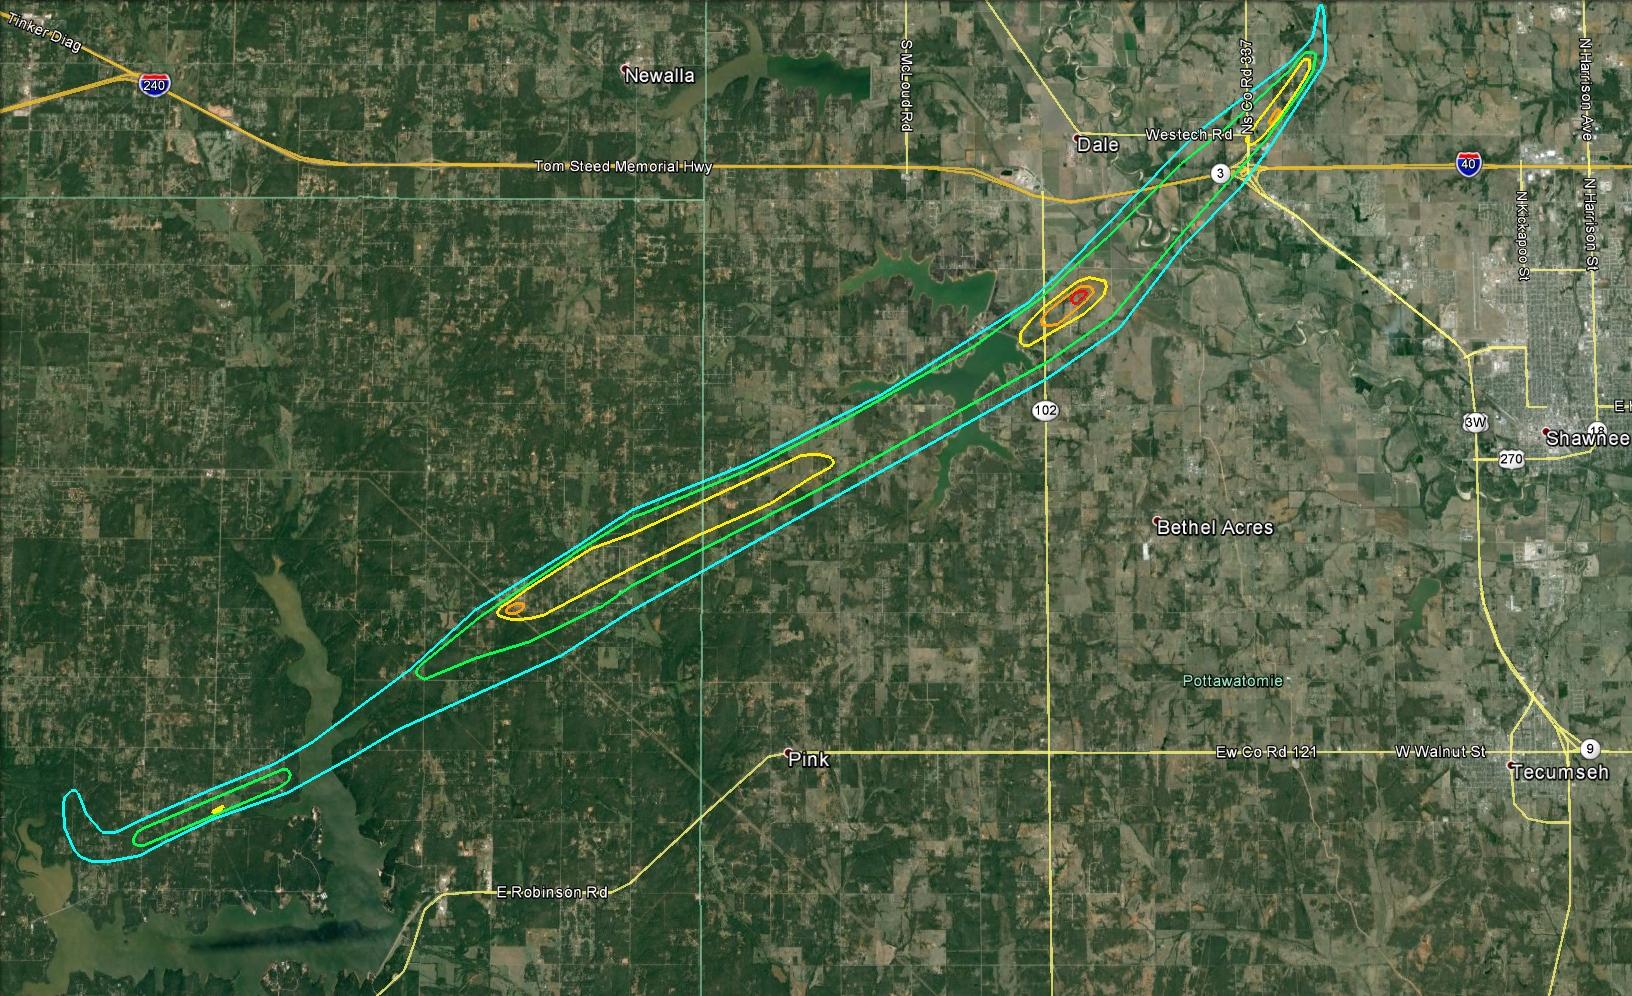 The May 19, 2013 Lake Thunderbird-Shawnee EF-4 Tornado